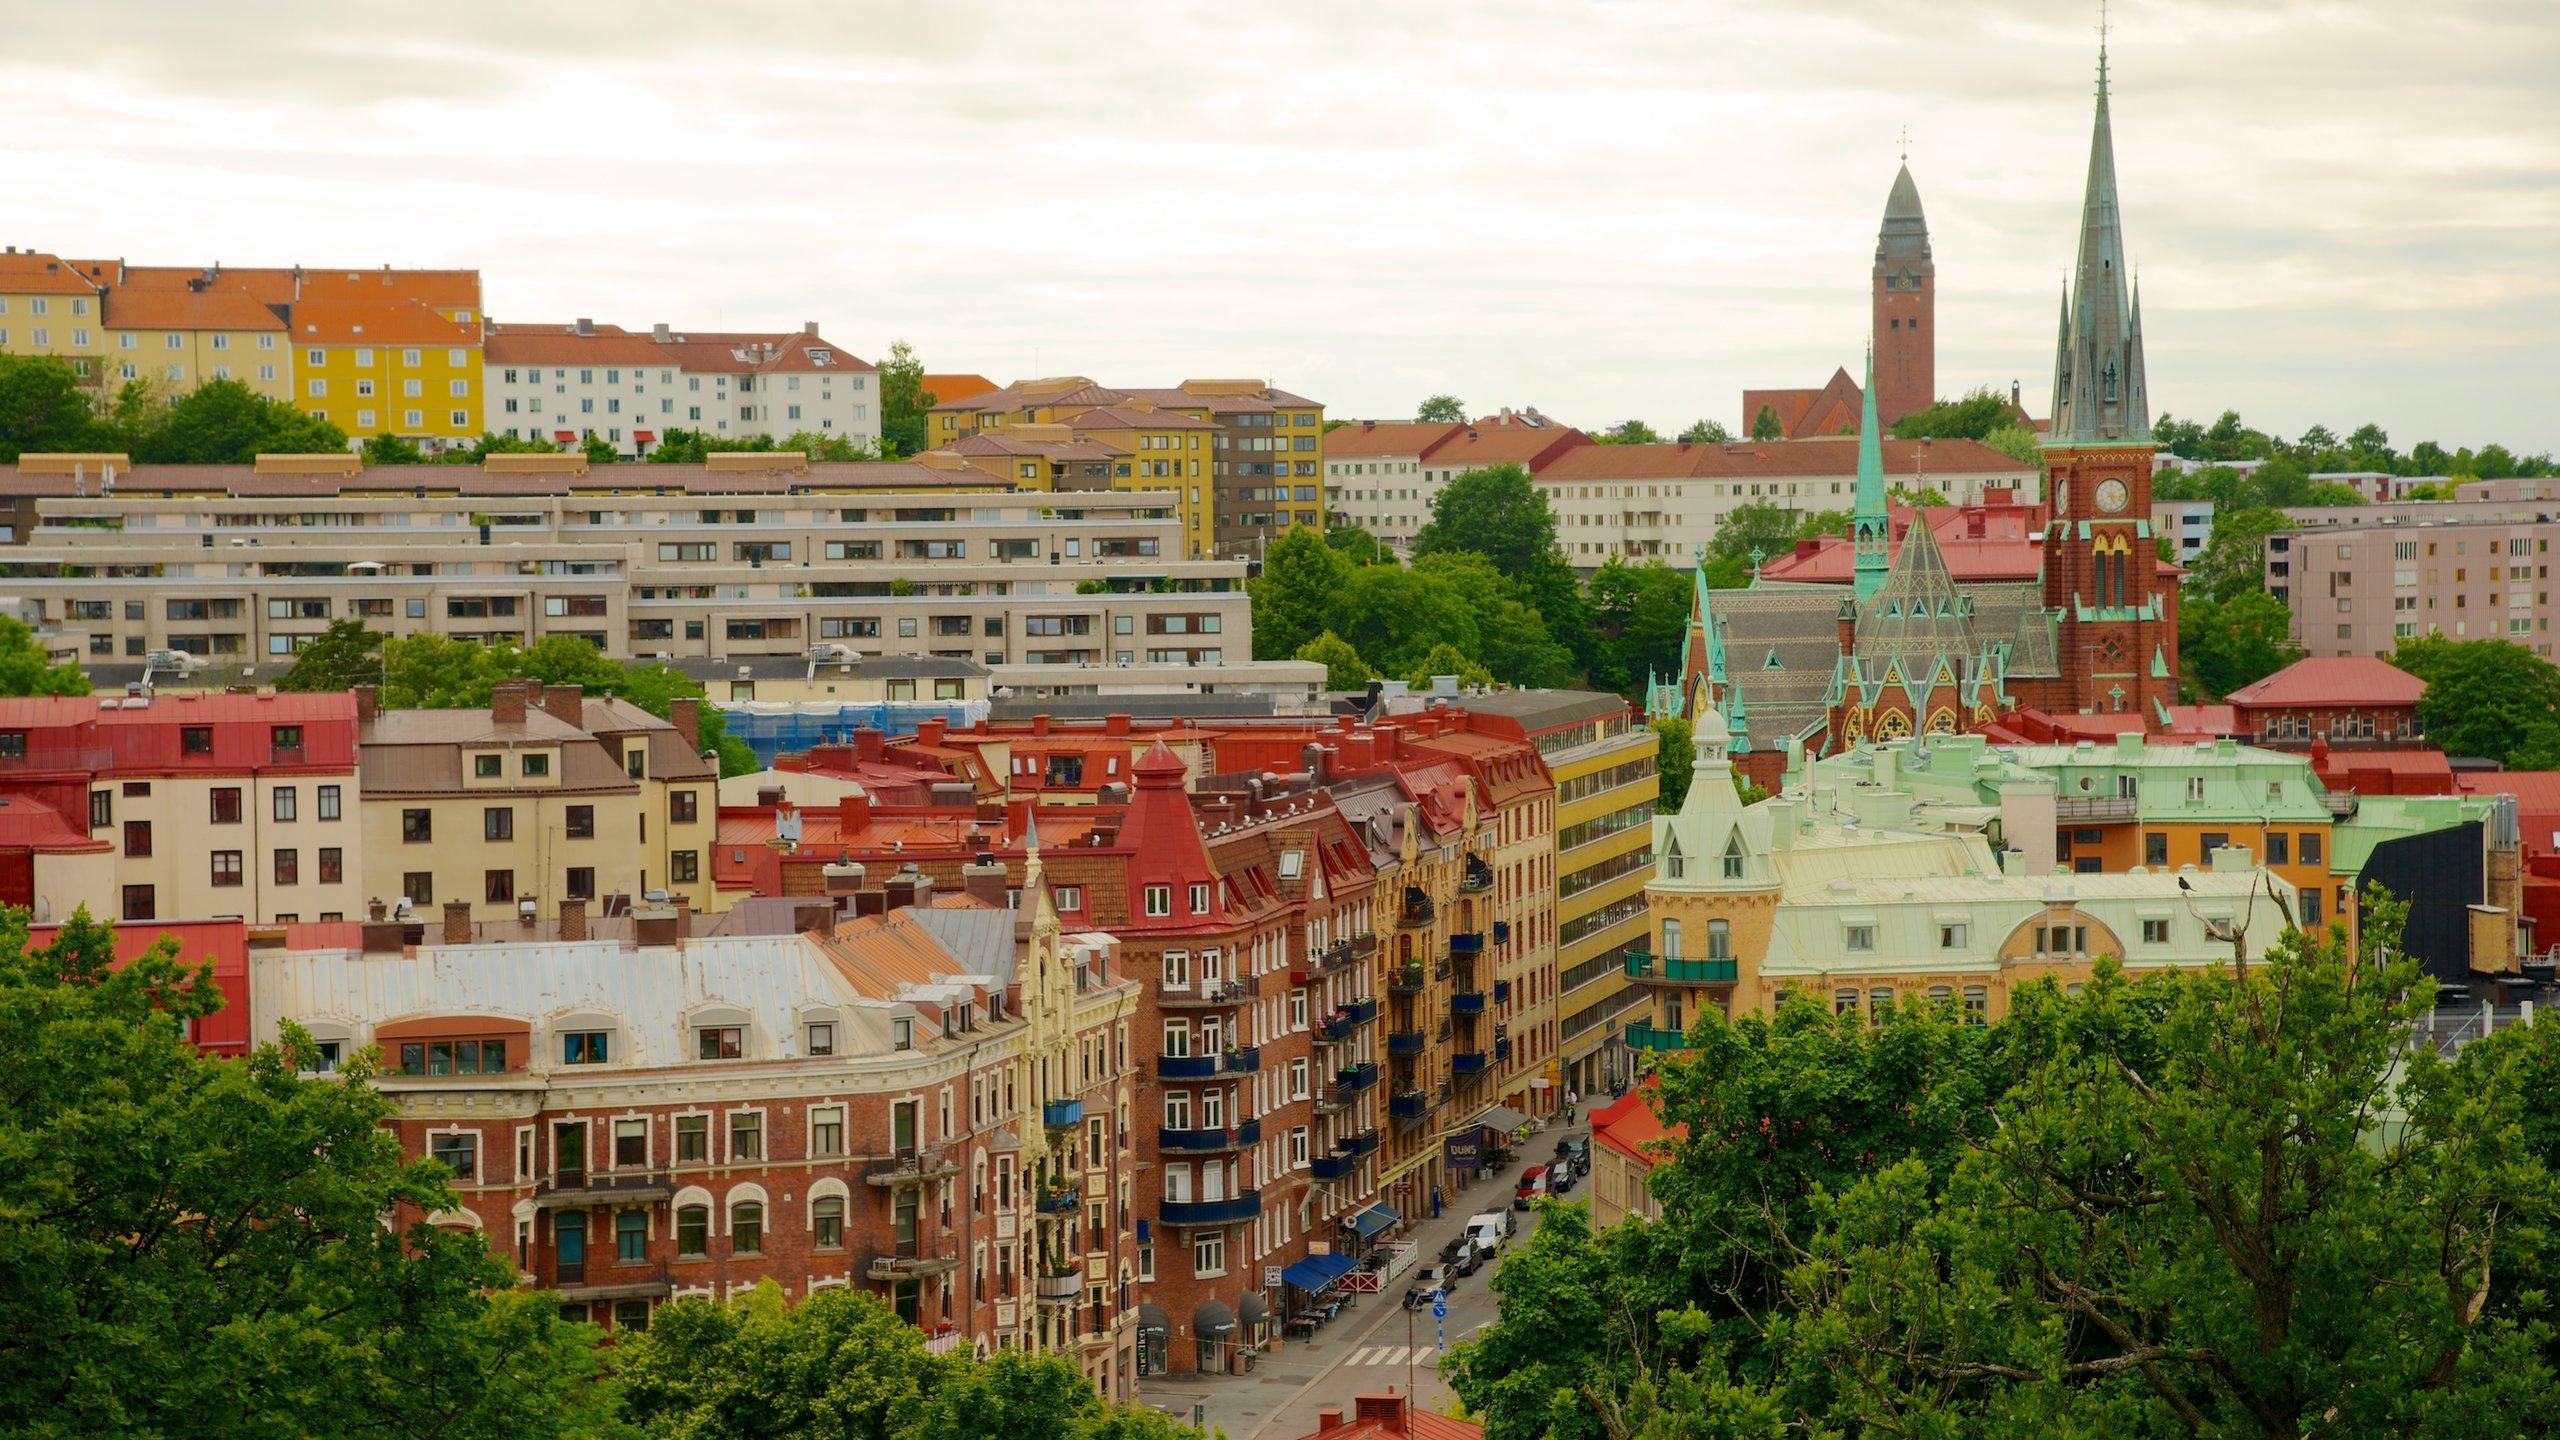 Gothenburg City Center, Gothenburg, Vastra Gotaland County, Sweden